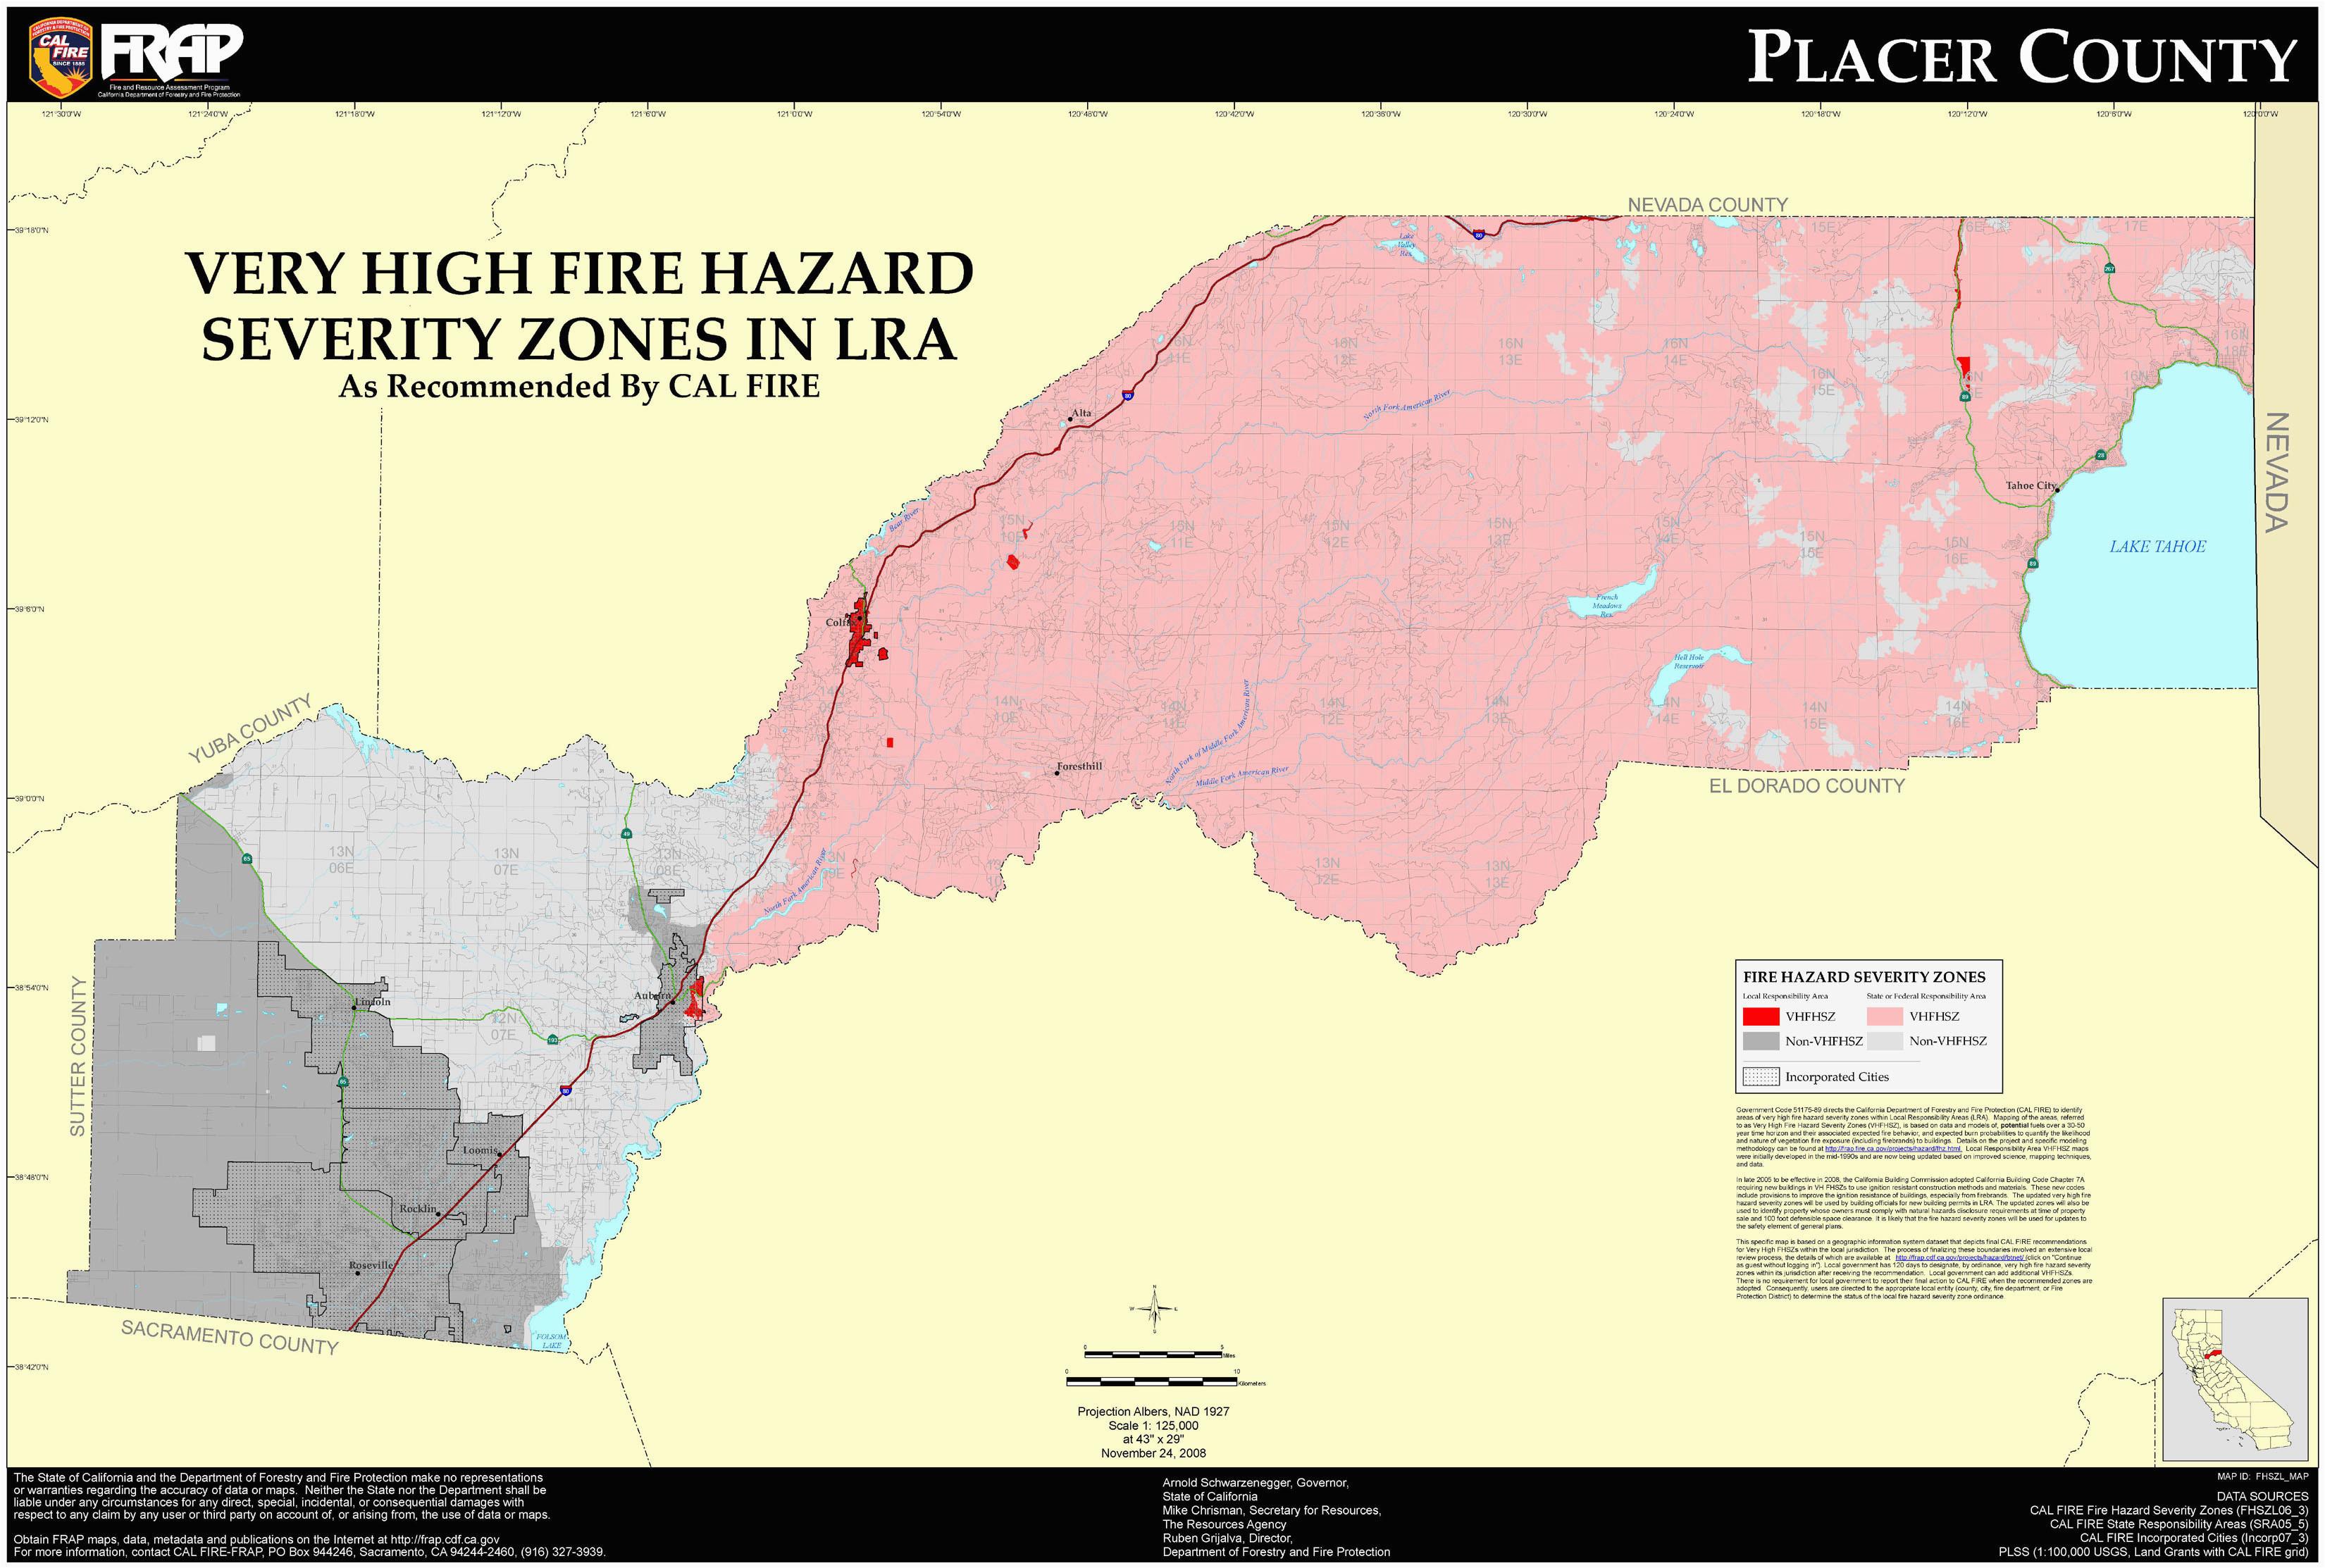 bakersfield california zip code map new city fresno zoning map